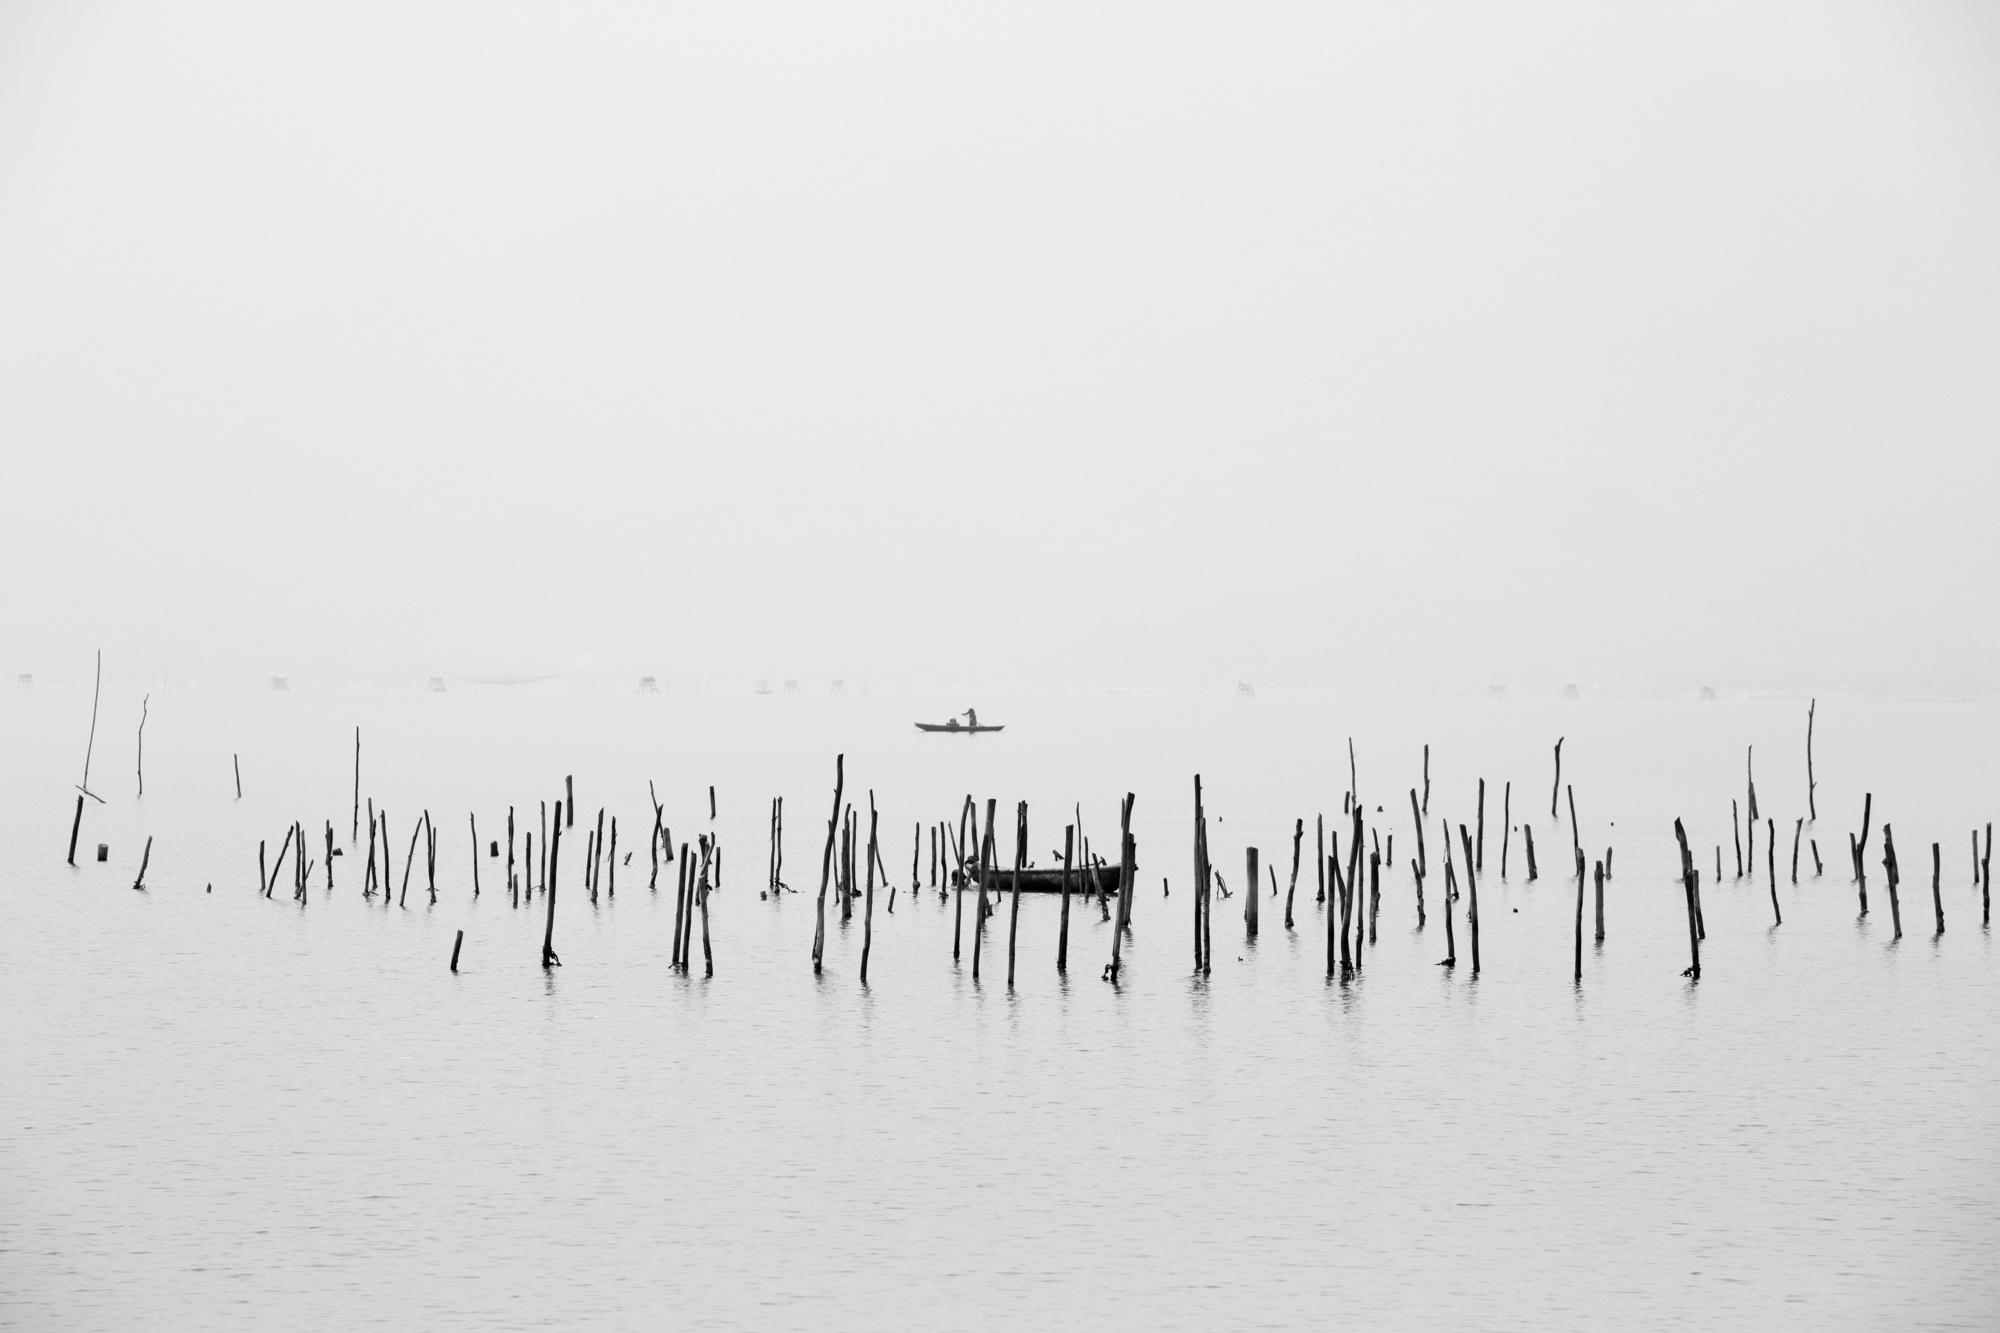 Fishing in Vietnam by gigin